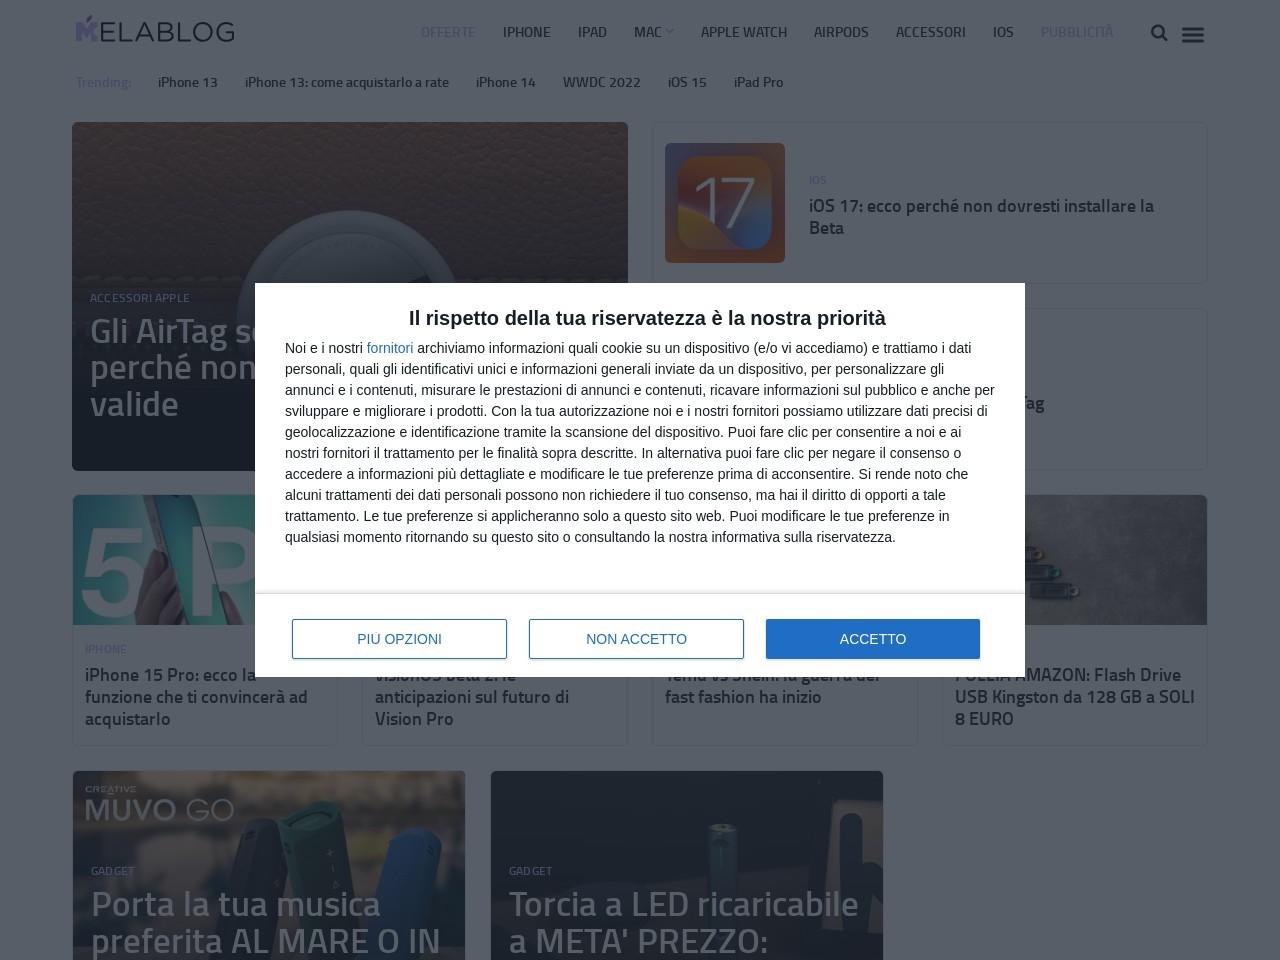 melablog